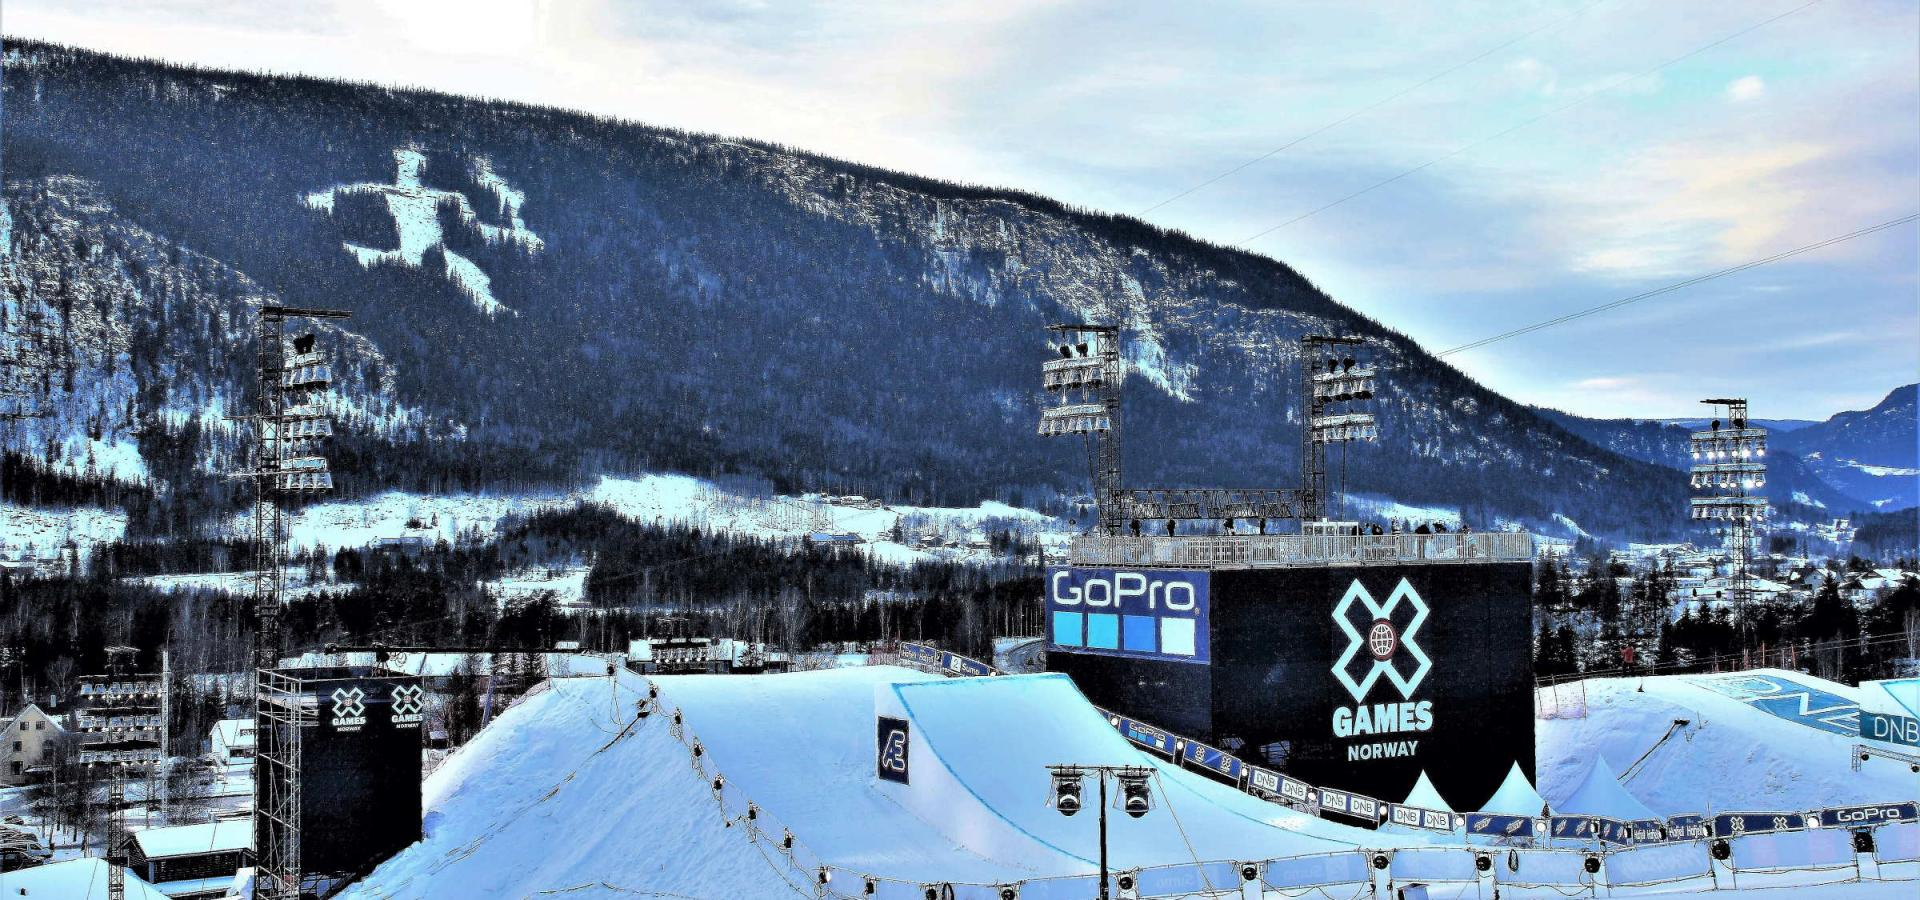 See Cool X Games 2020 Norway Place Gallery @KoolGadgetz.com